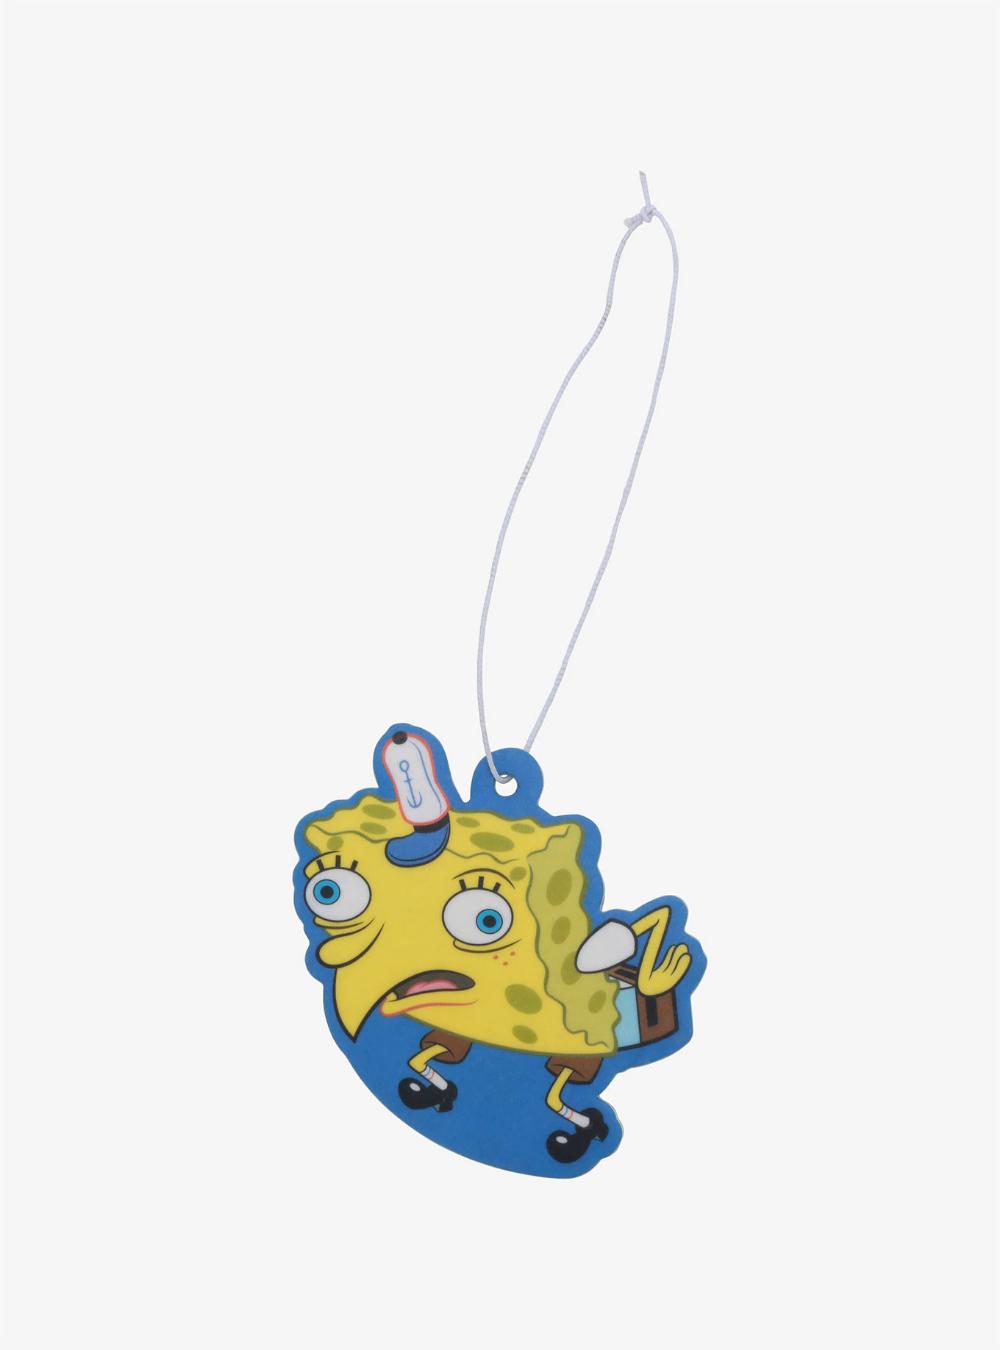 Spongebob Squarepants Chicken Air Freshener Spongebob Air Freshener Squarepants